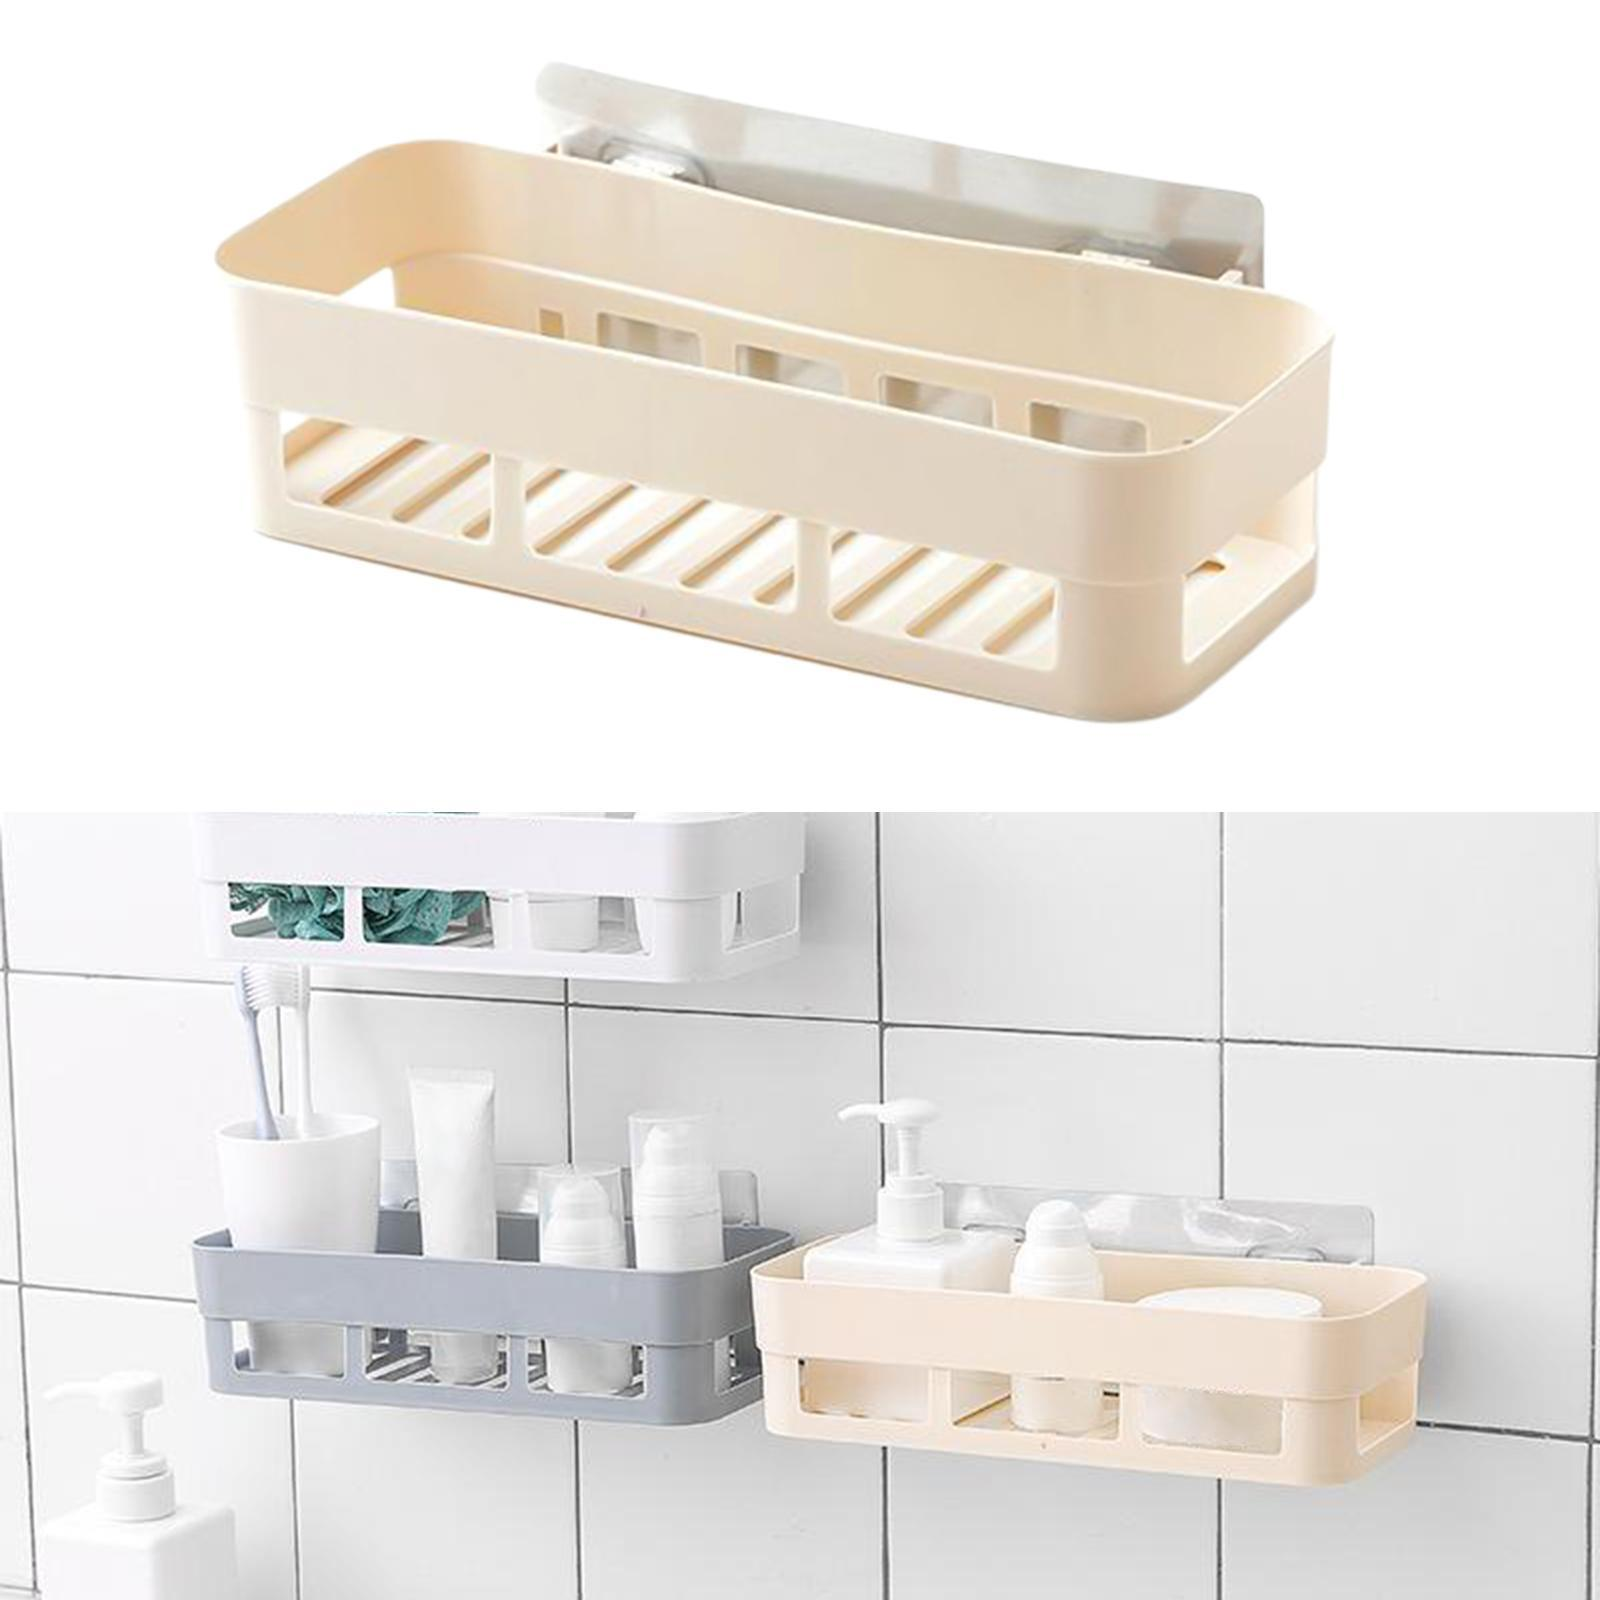 thumbnail 22 - Wall-Suction-Bathroom-Shelf-Shower-Caddy-Wall-Mount-Storage-Rack-Organizer